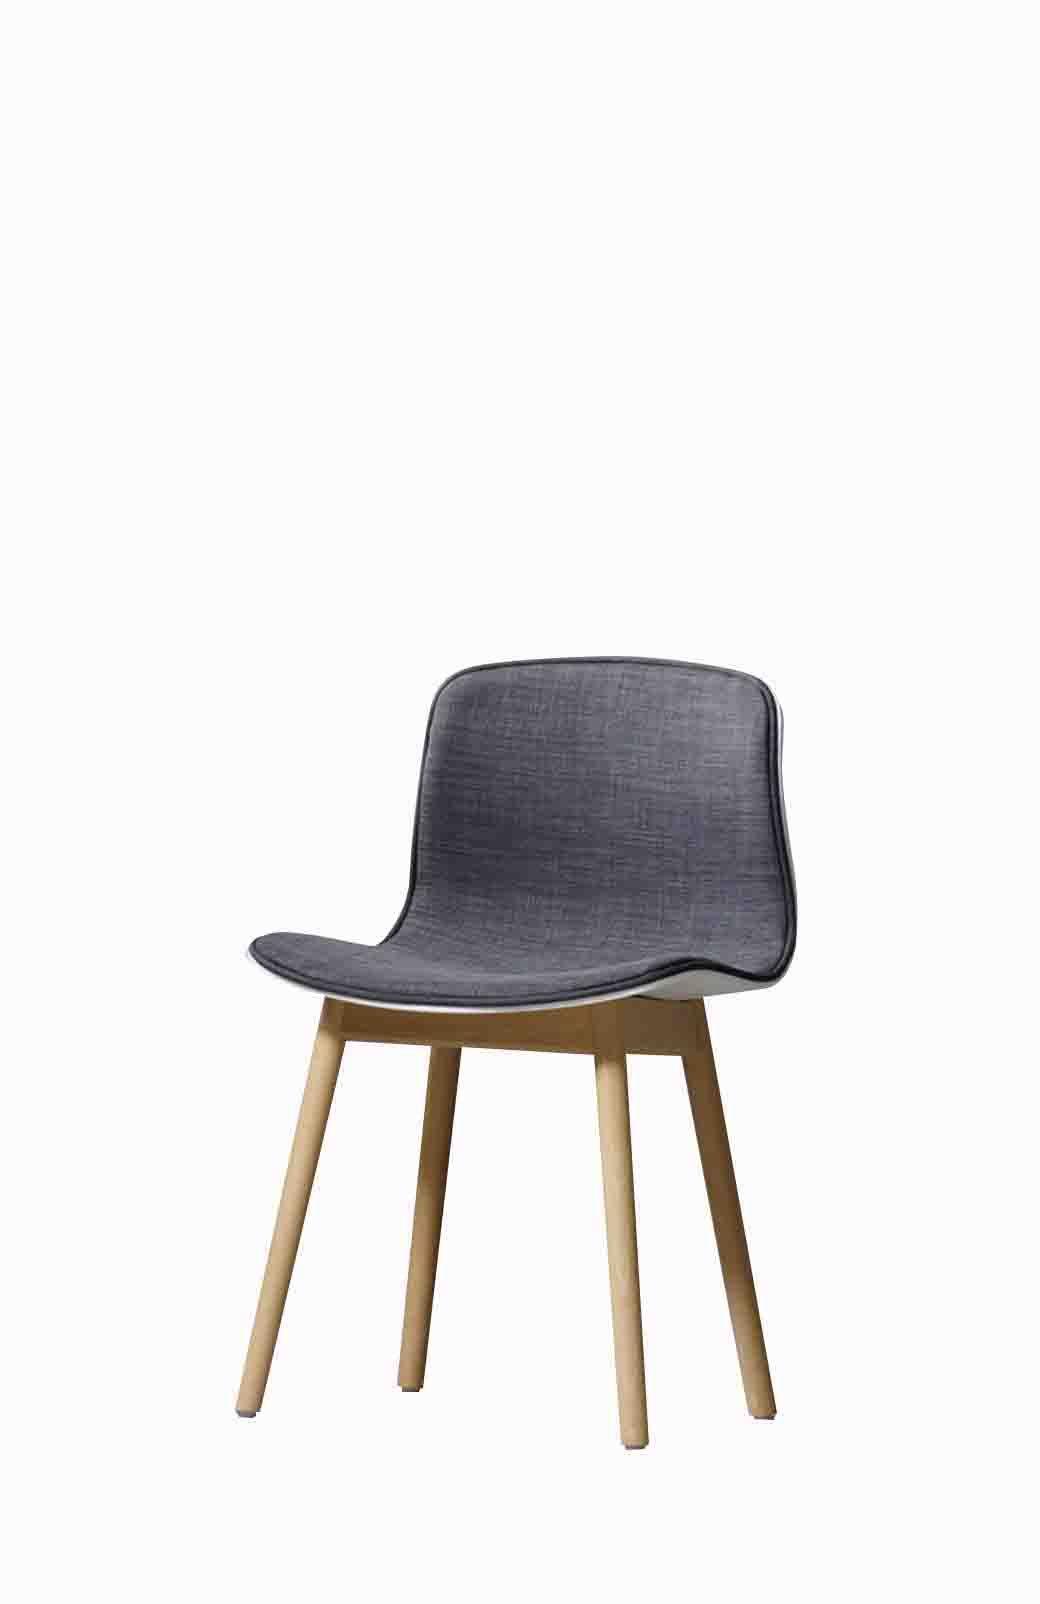 Modern Style Dining Chair Grey W480 D390 H810 Pp Pp Beech